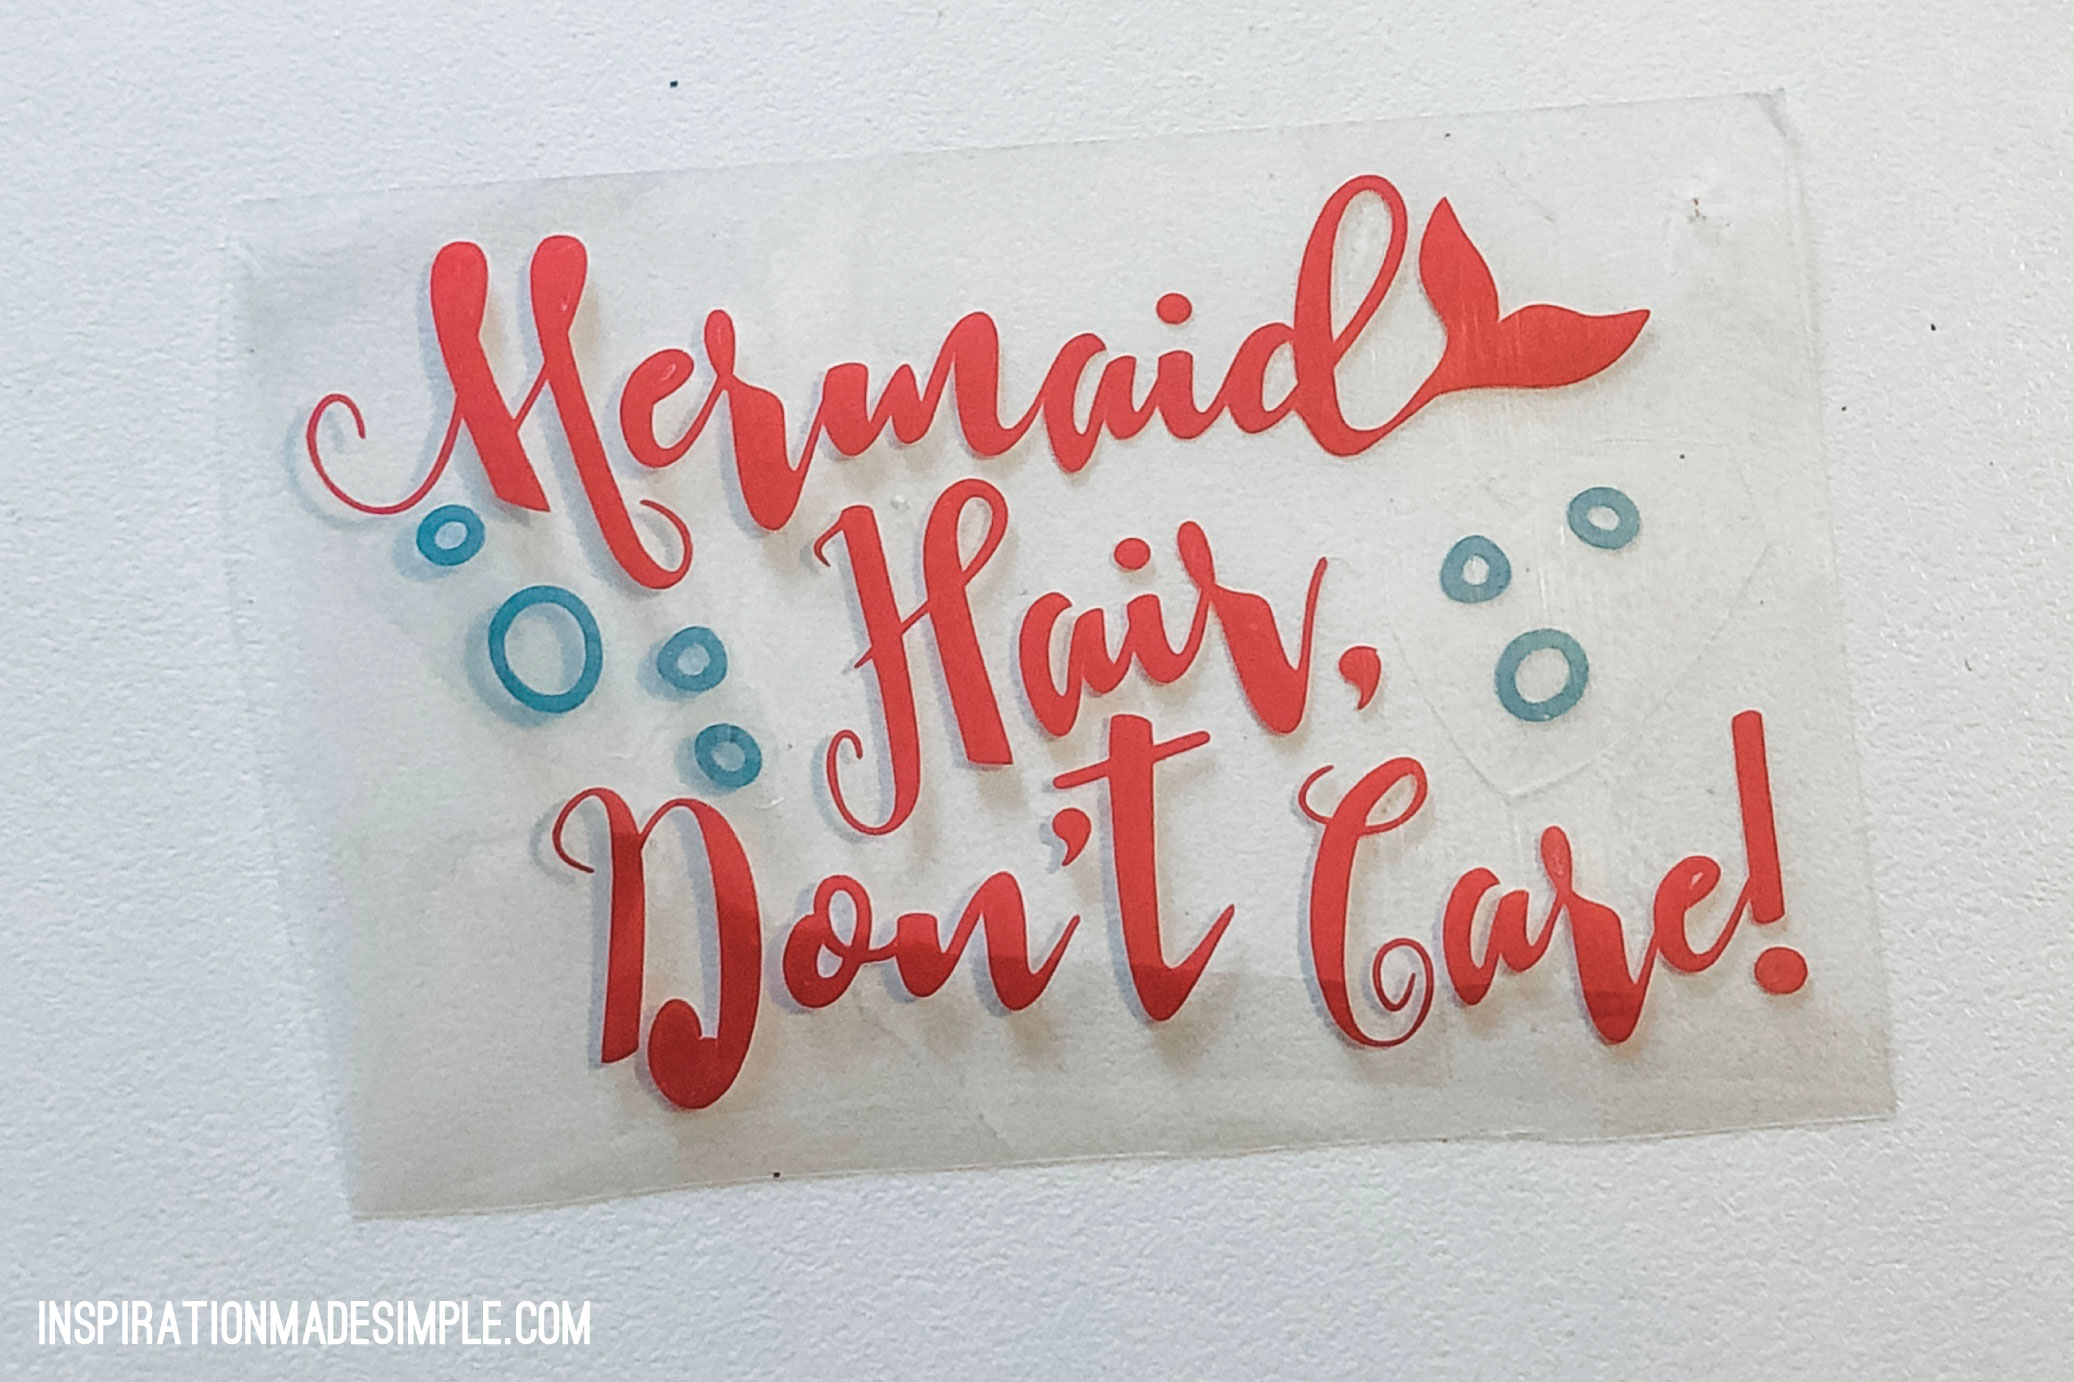 Mermaid Hair, Don't Care DIY Hat with Cricut Maker